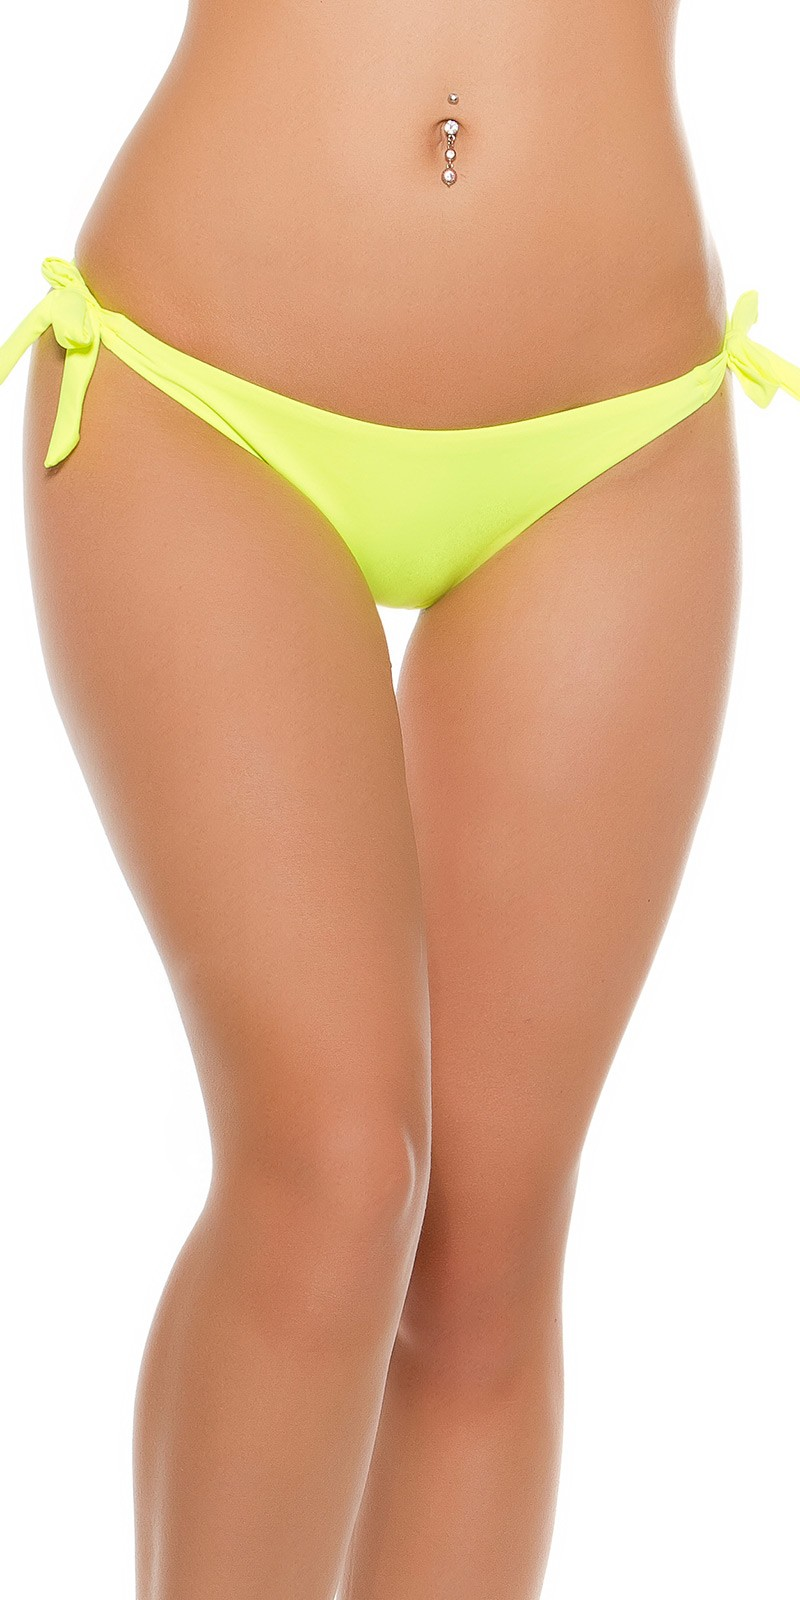 CB201 Costume da bagno perizoma tanga per topless Neongel - LINGERIE ...